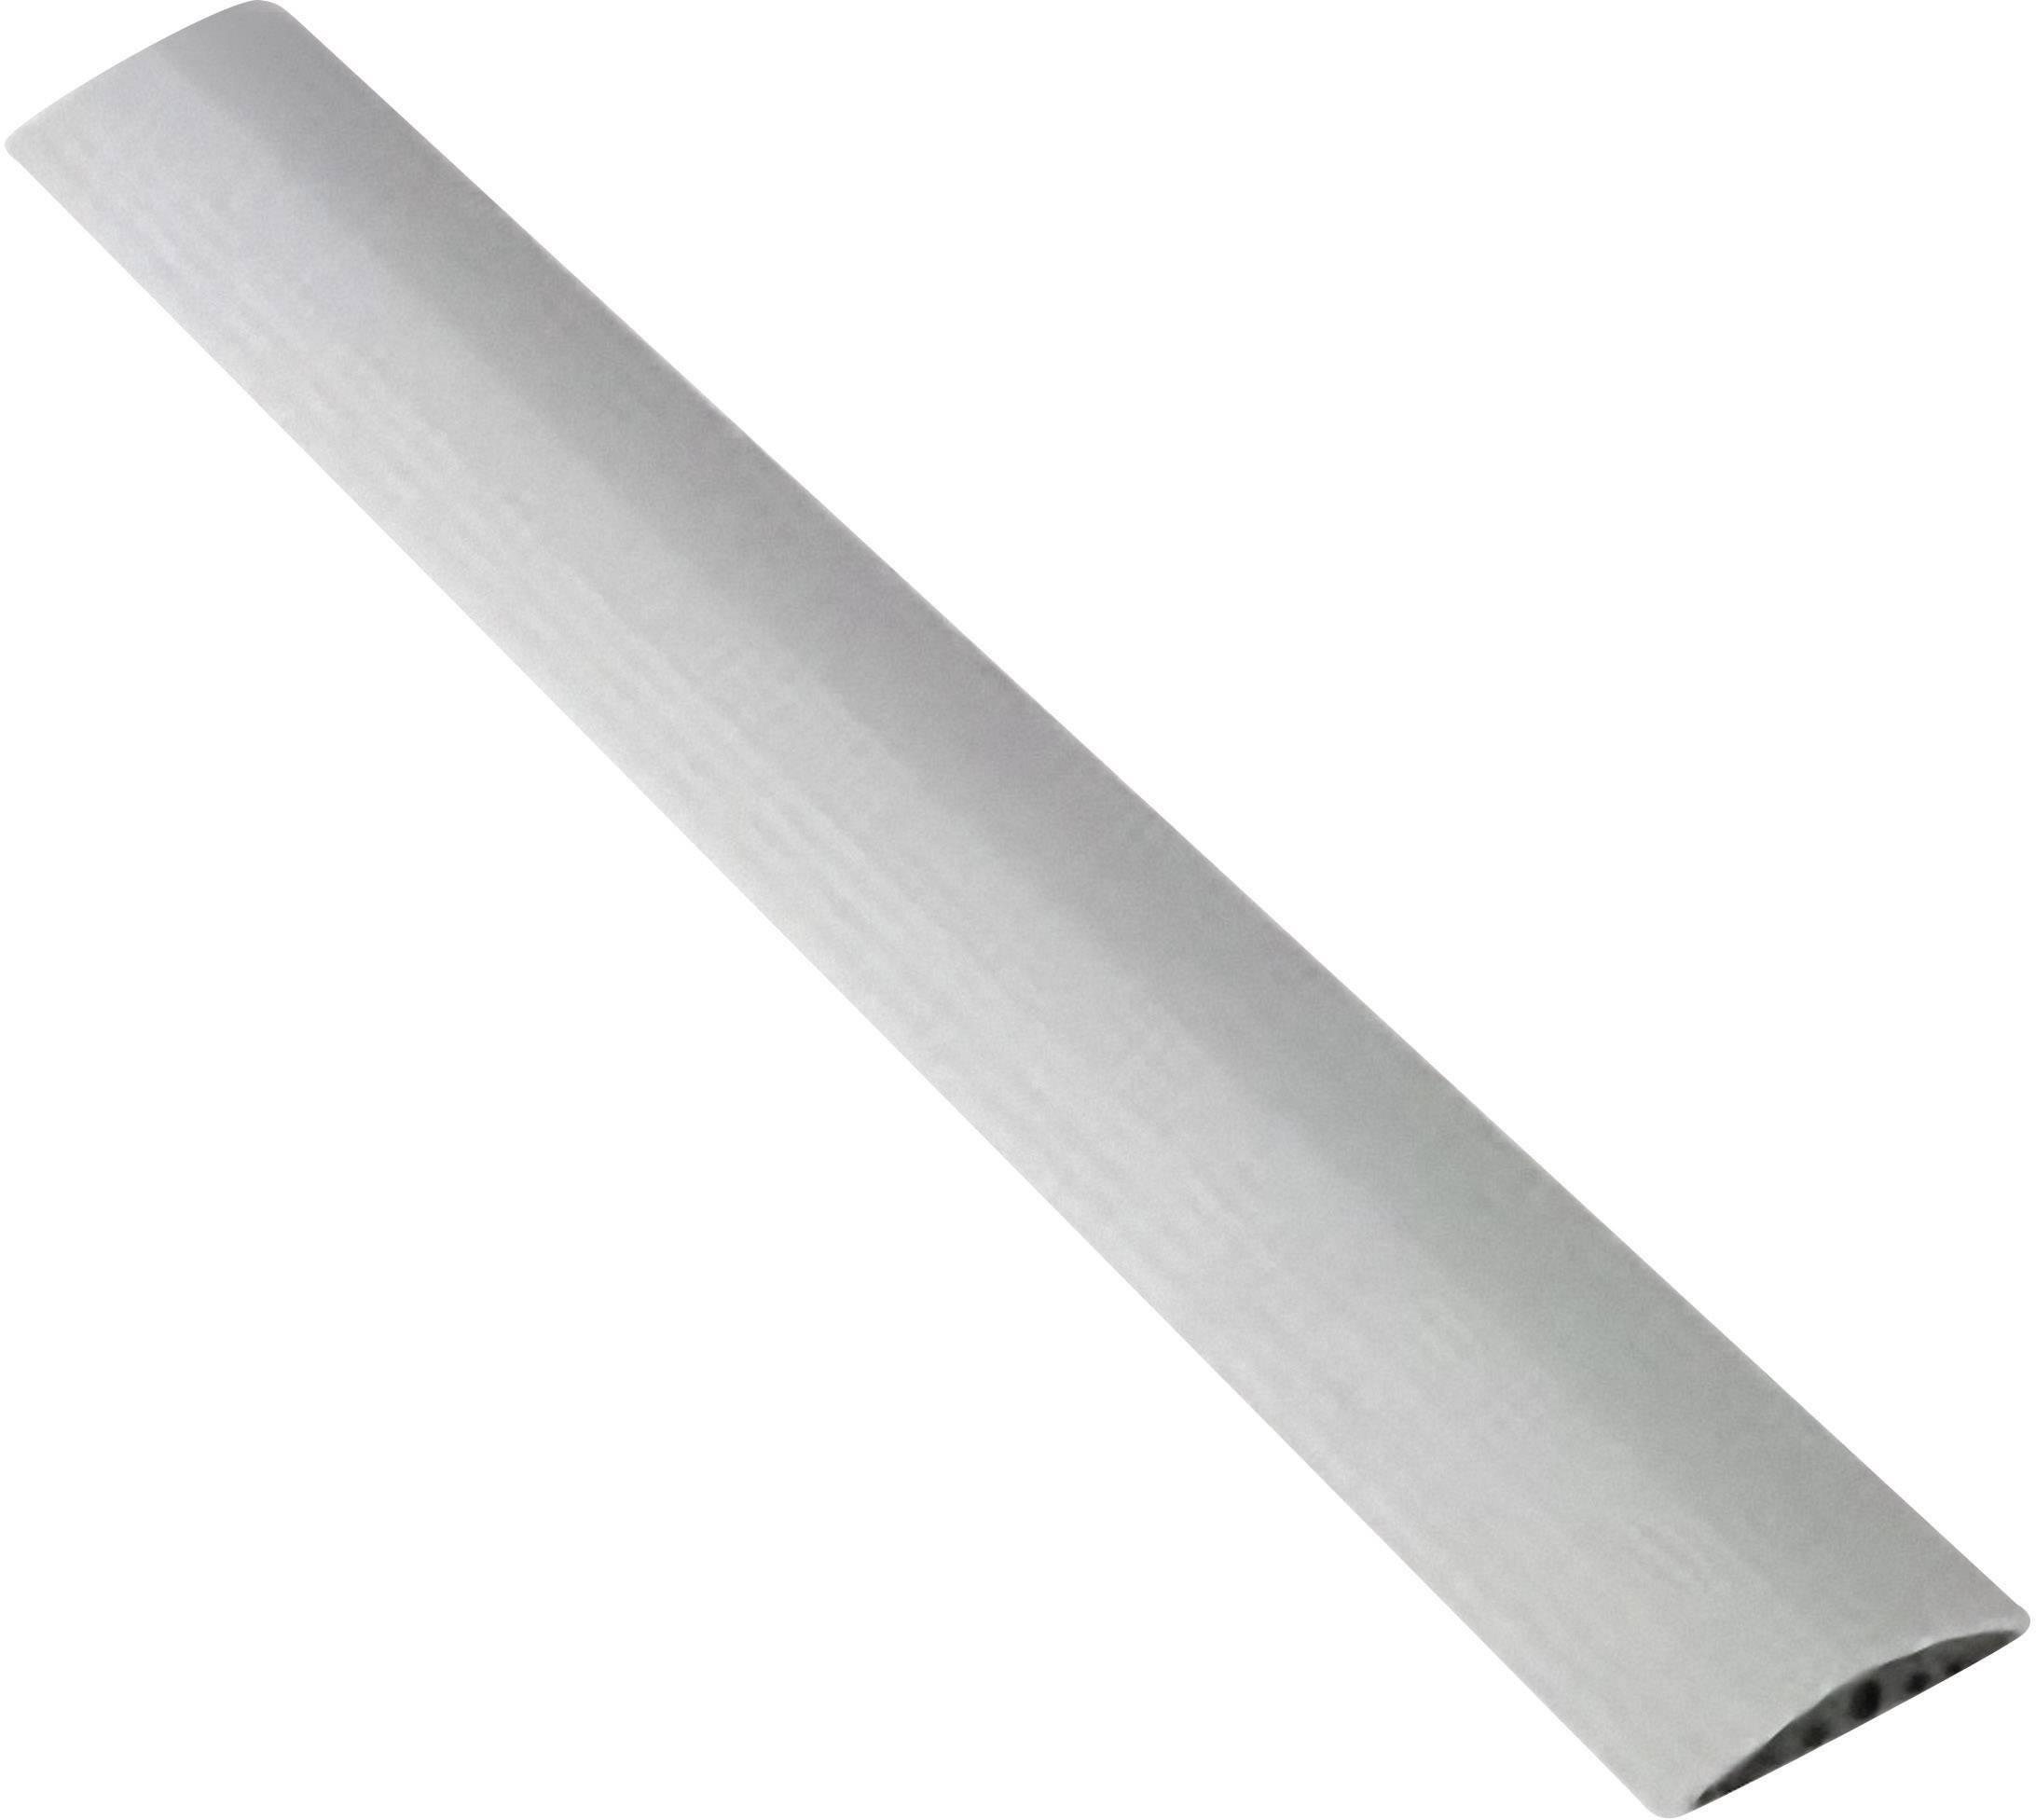 Káblový mostík Serpa 5.01038.7042 B15, (d x š) 3000 mm x 150 mm, svetlosivá, 1 ks